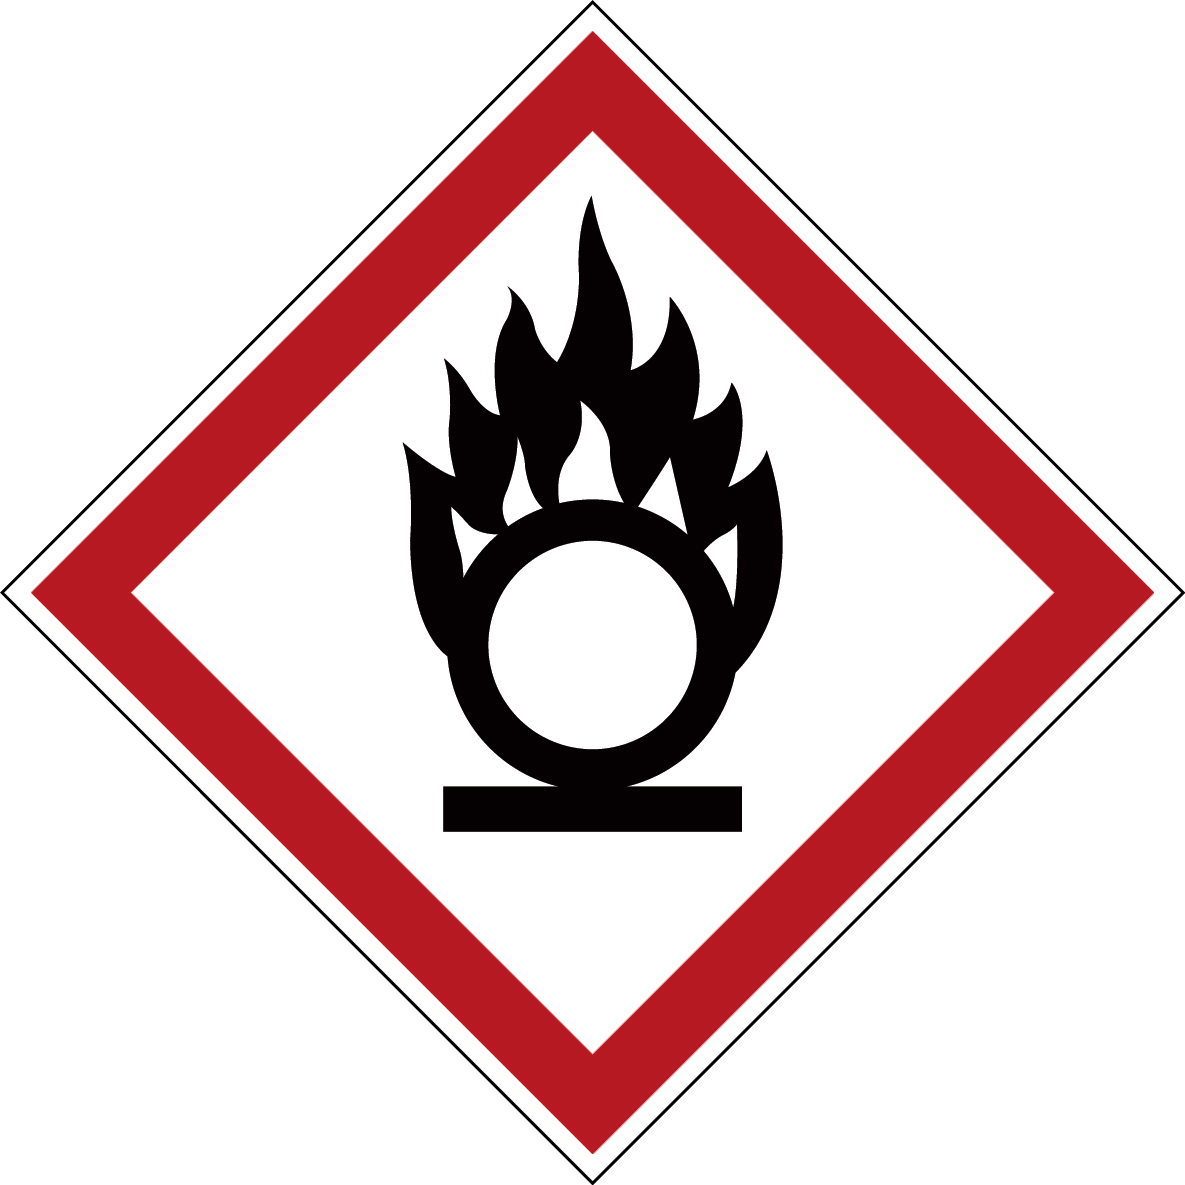 Varningsetikett kemikaliebeständig - Oxiderande 250 st